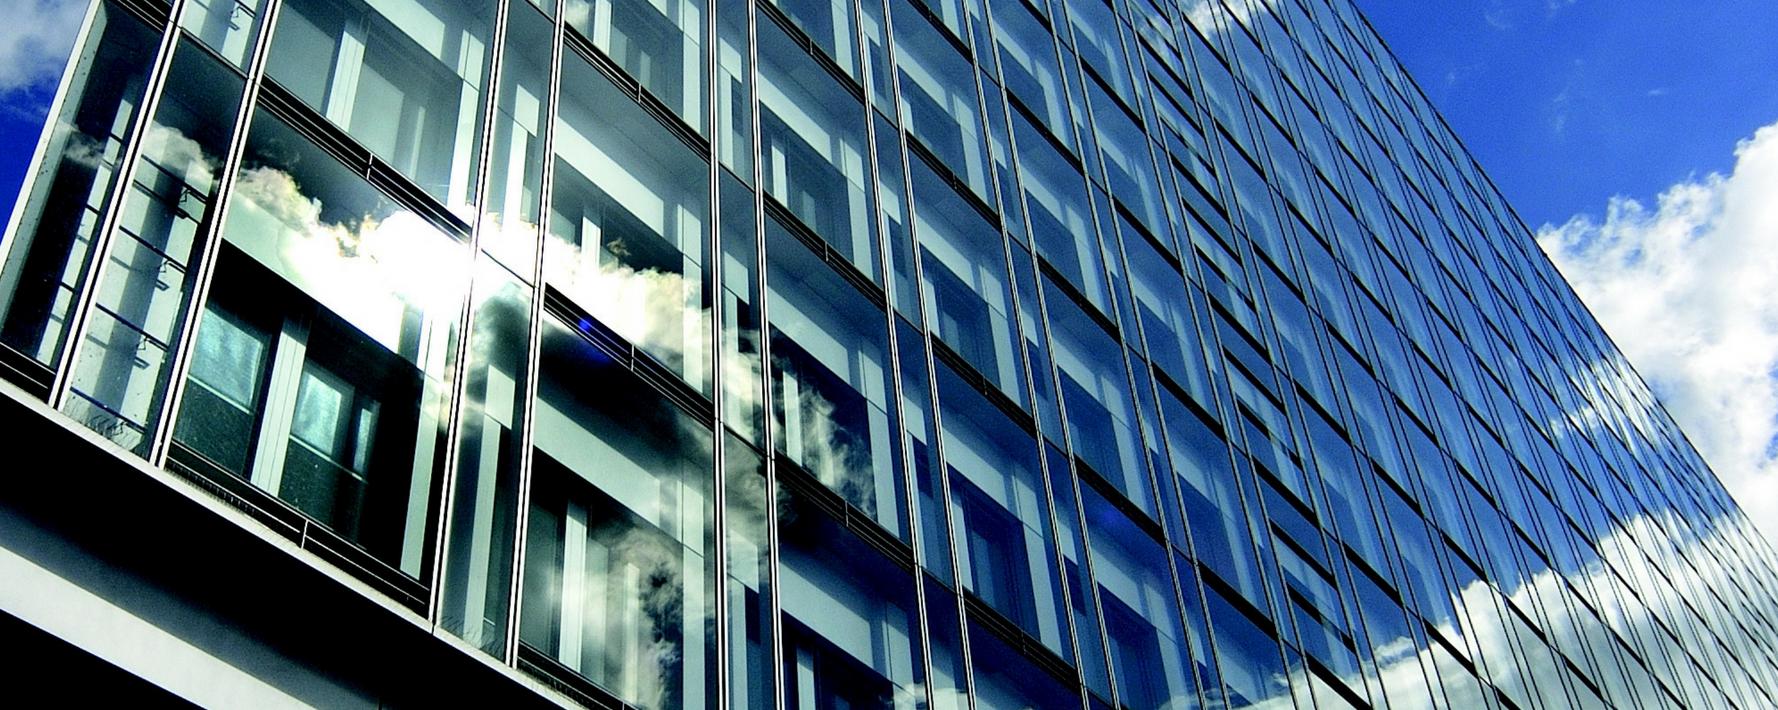 SGG COOL-LITE ST BRIGHT SILVER | Hoge transparantie & flexibiliteit voor ideaal comfort